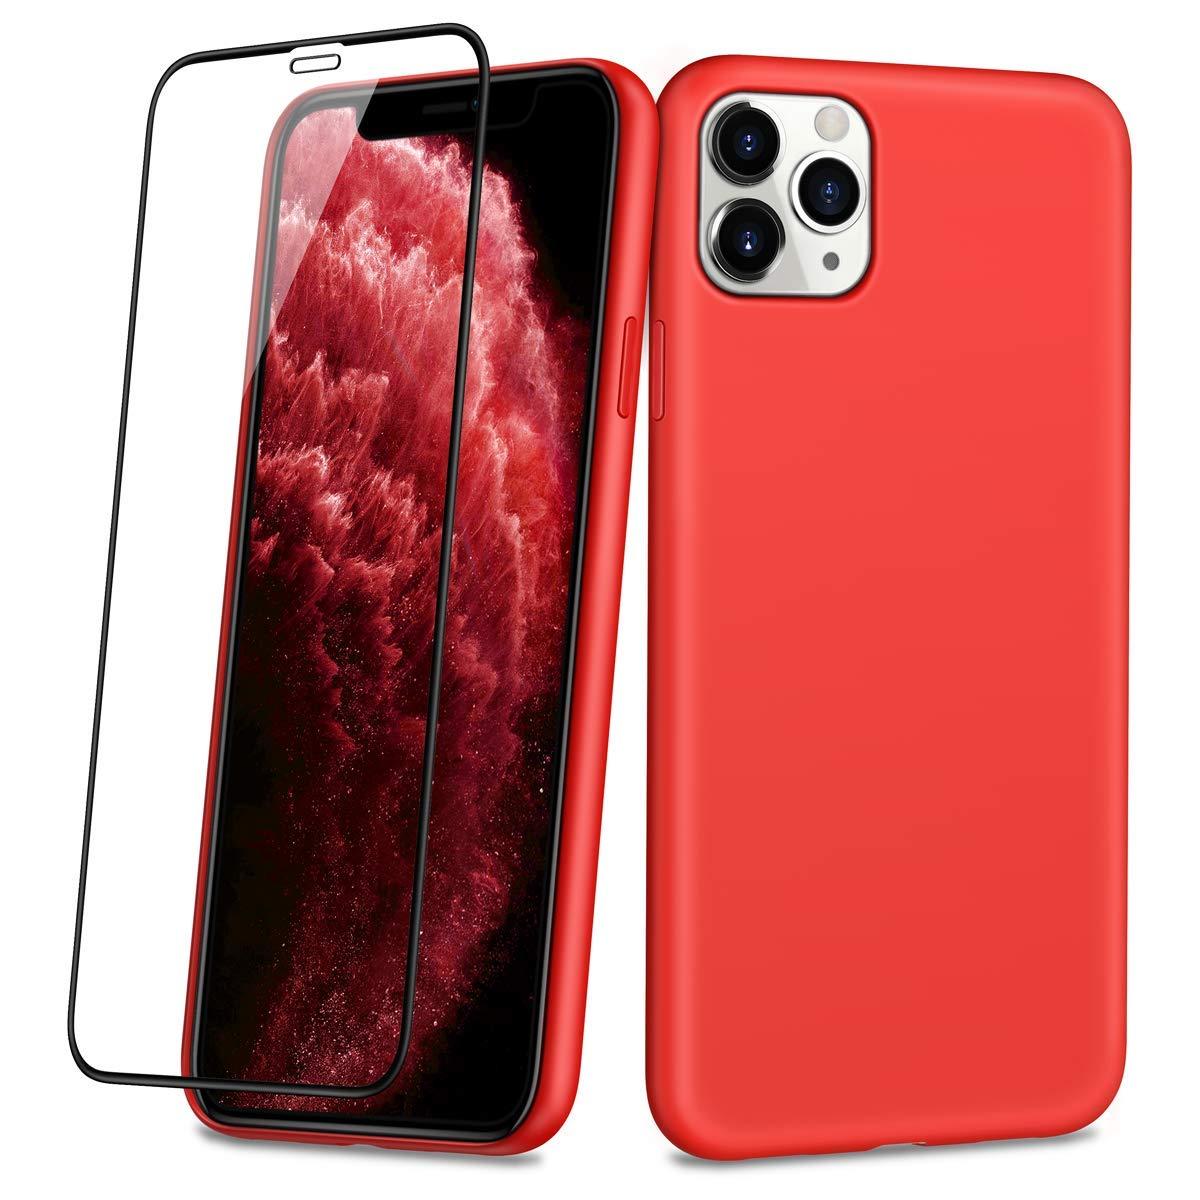 Funda + Vidrio para Iphone 11 Pro Max (6.5) AEMOTOY [7XLFC3]